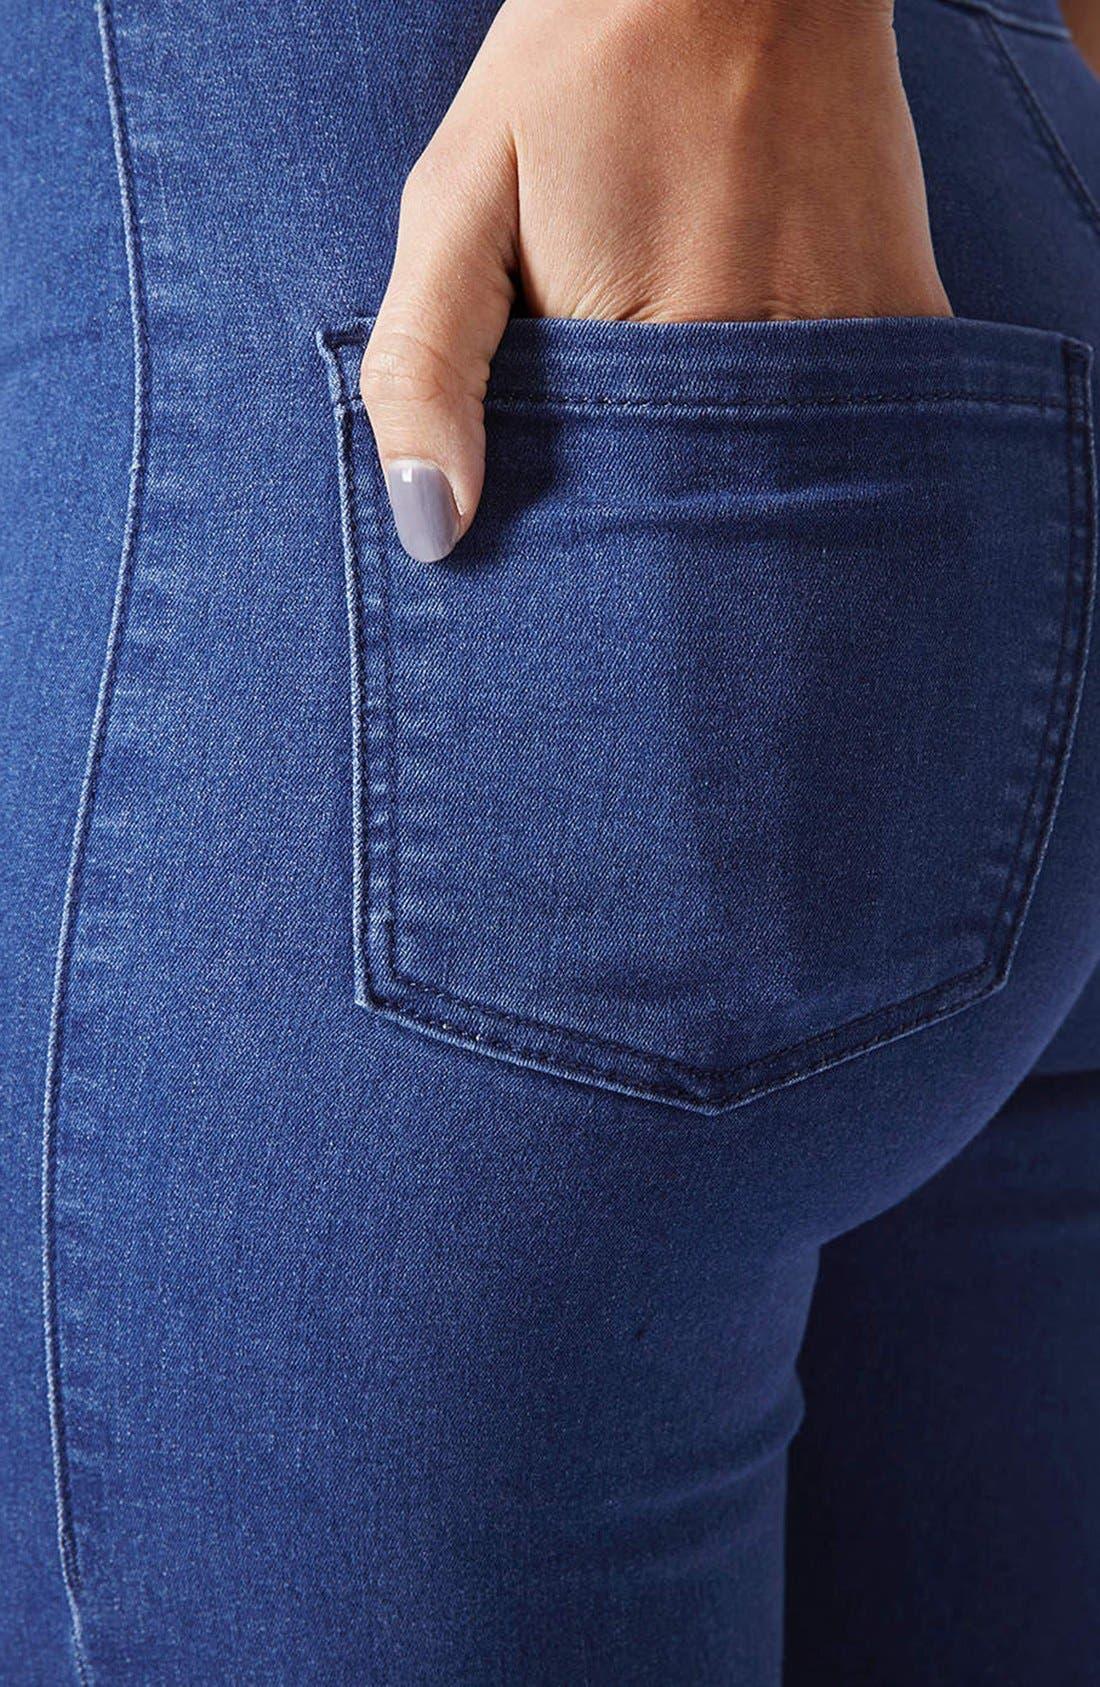 Alternate Image 4  - Topshop Moto 'Joni' High Rise Skinny Jeans (Regular, Short & Long) (Blue)